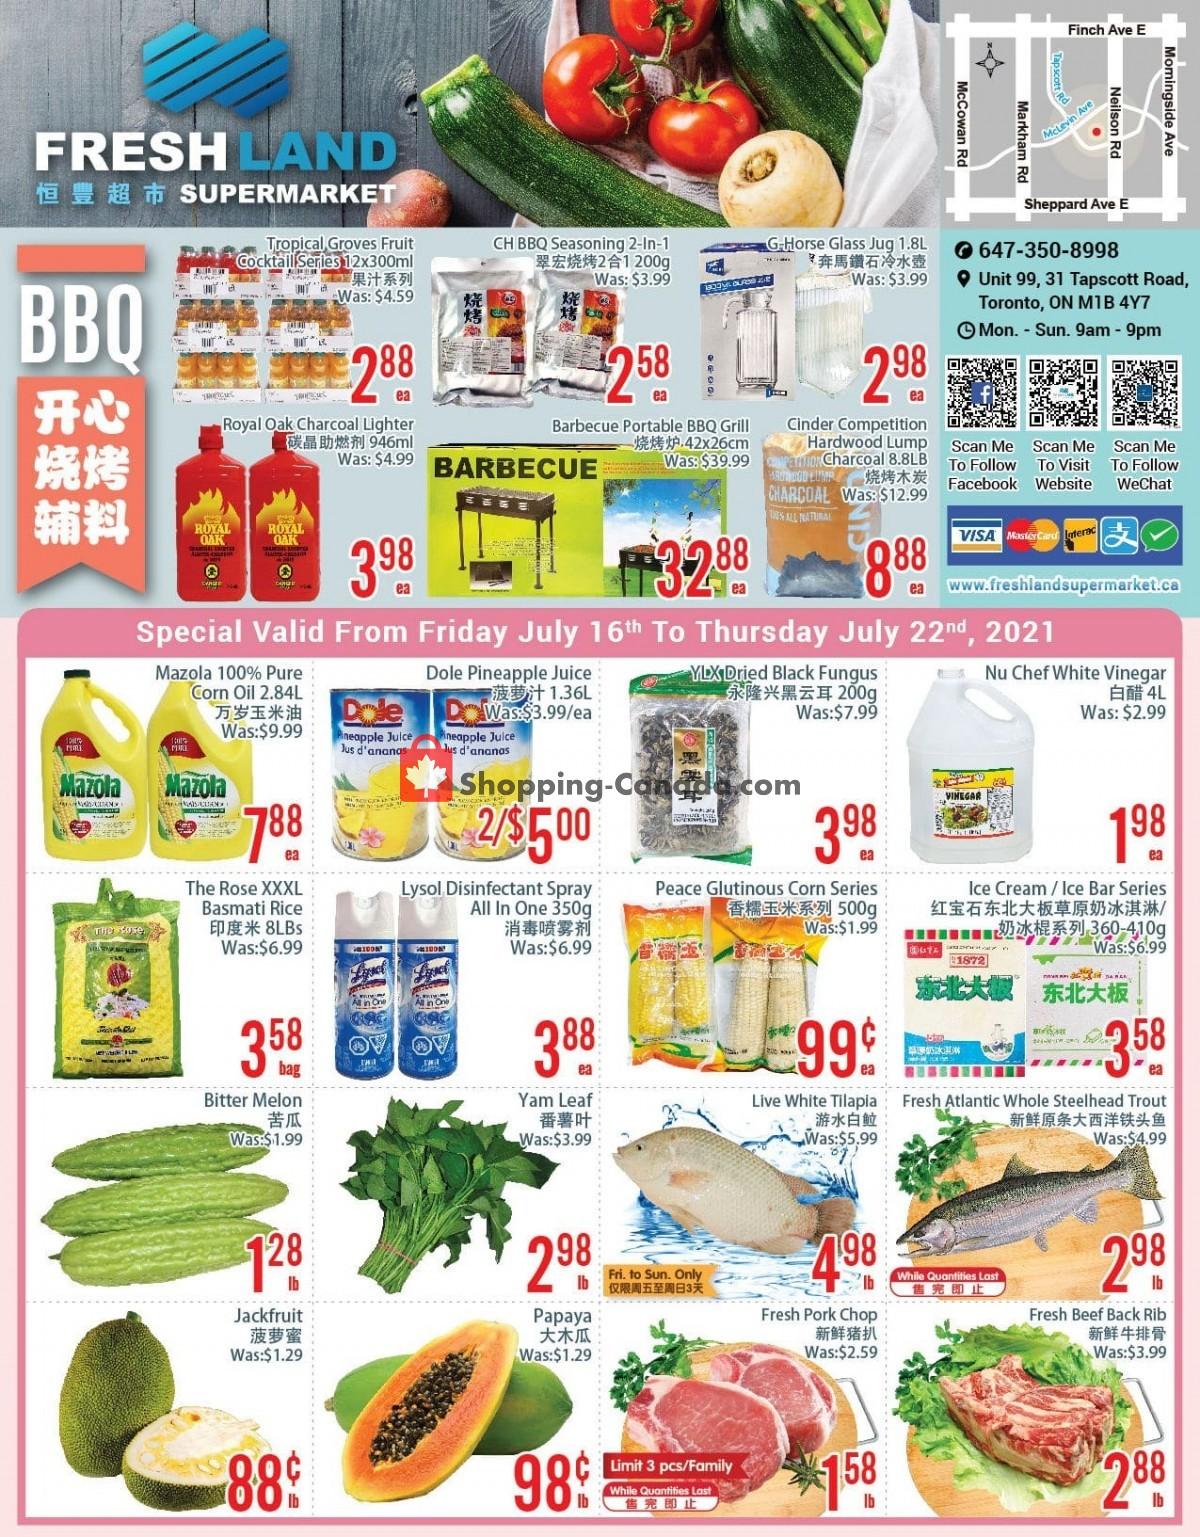 Flyer FreshLand Supermarket Canada - from Friday July 16, 2021 to Thursday July 22, 2021